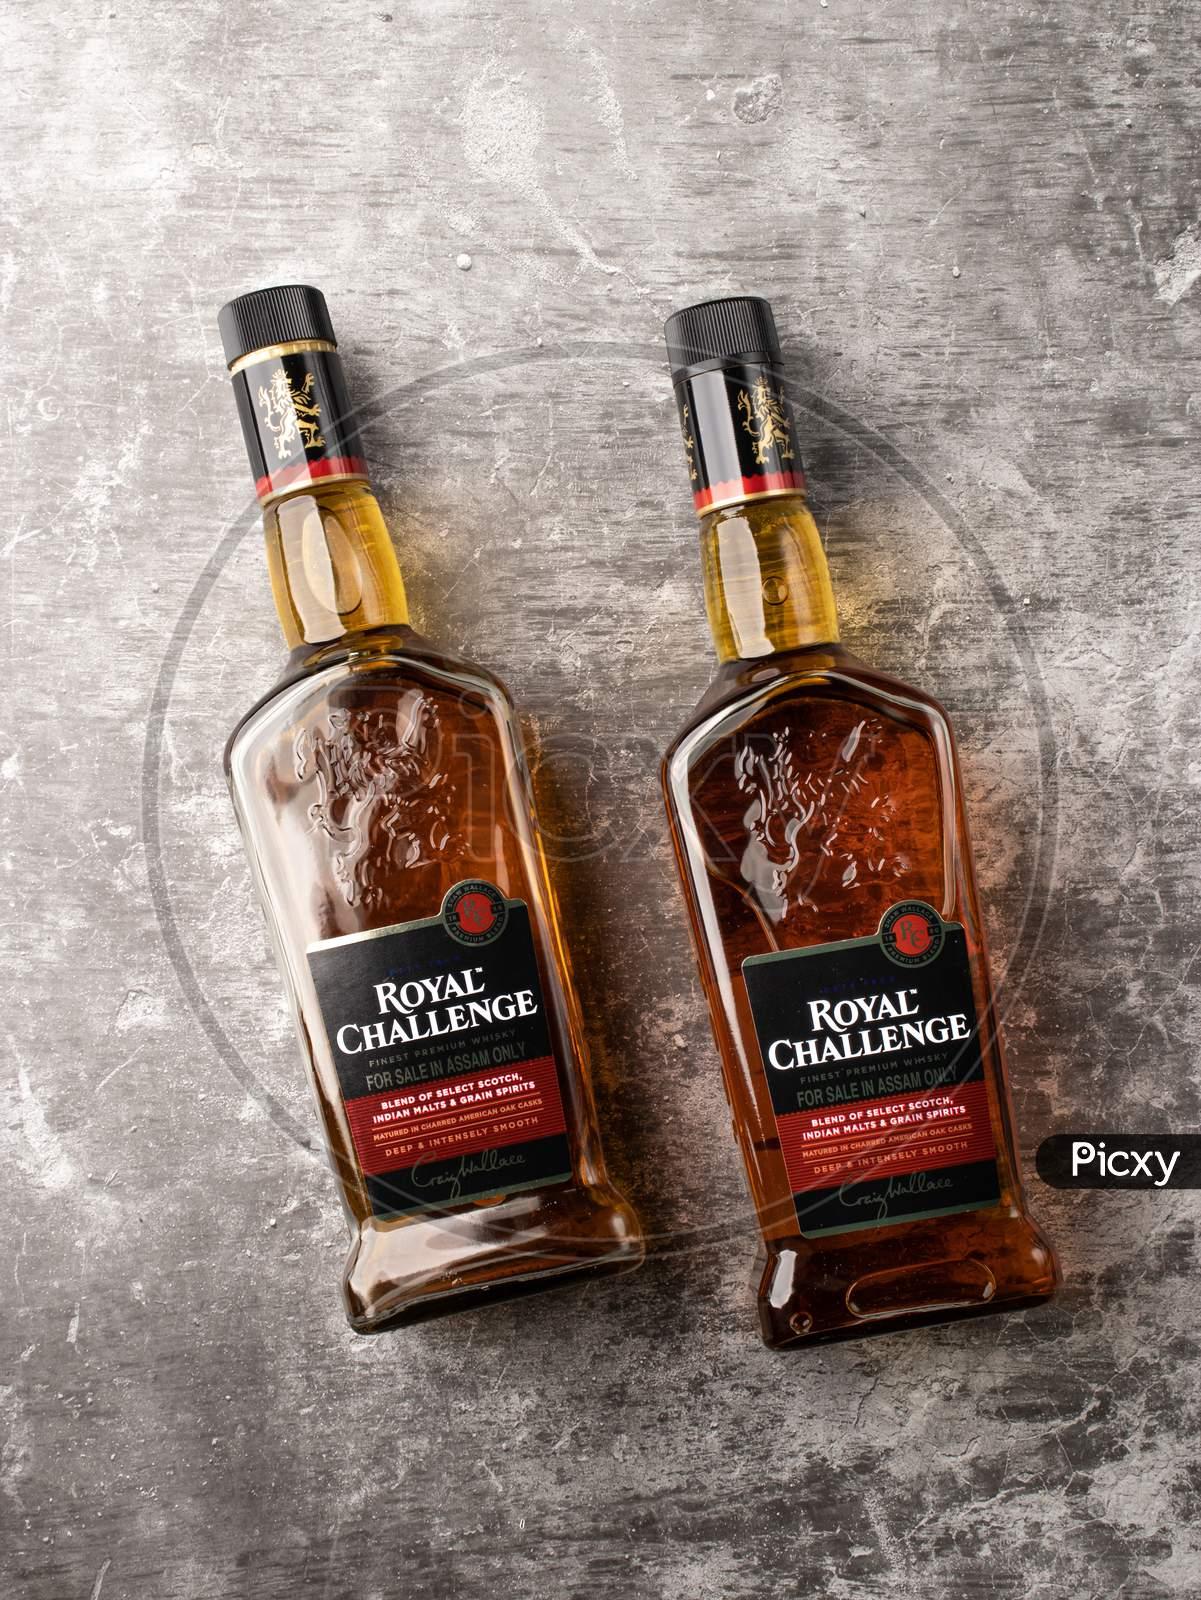 Assam, india - April 18, 2021 : Royal challenge whisky bottle stock image.